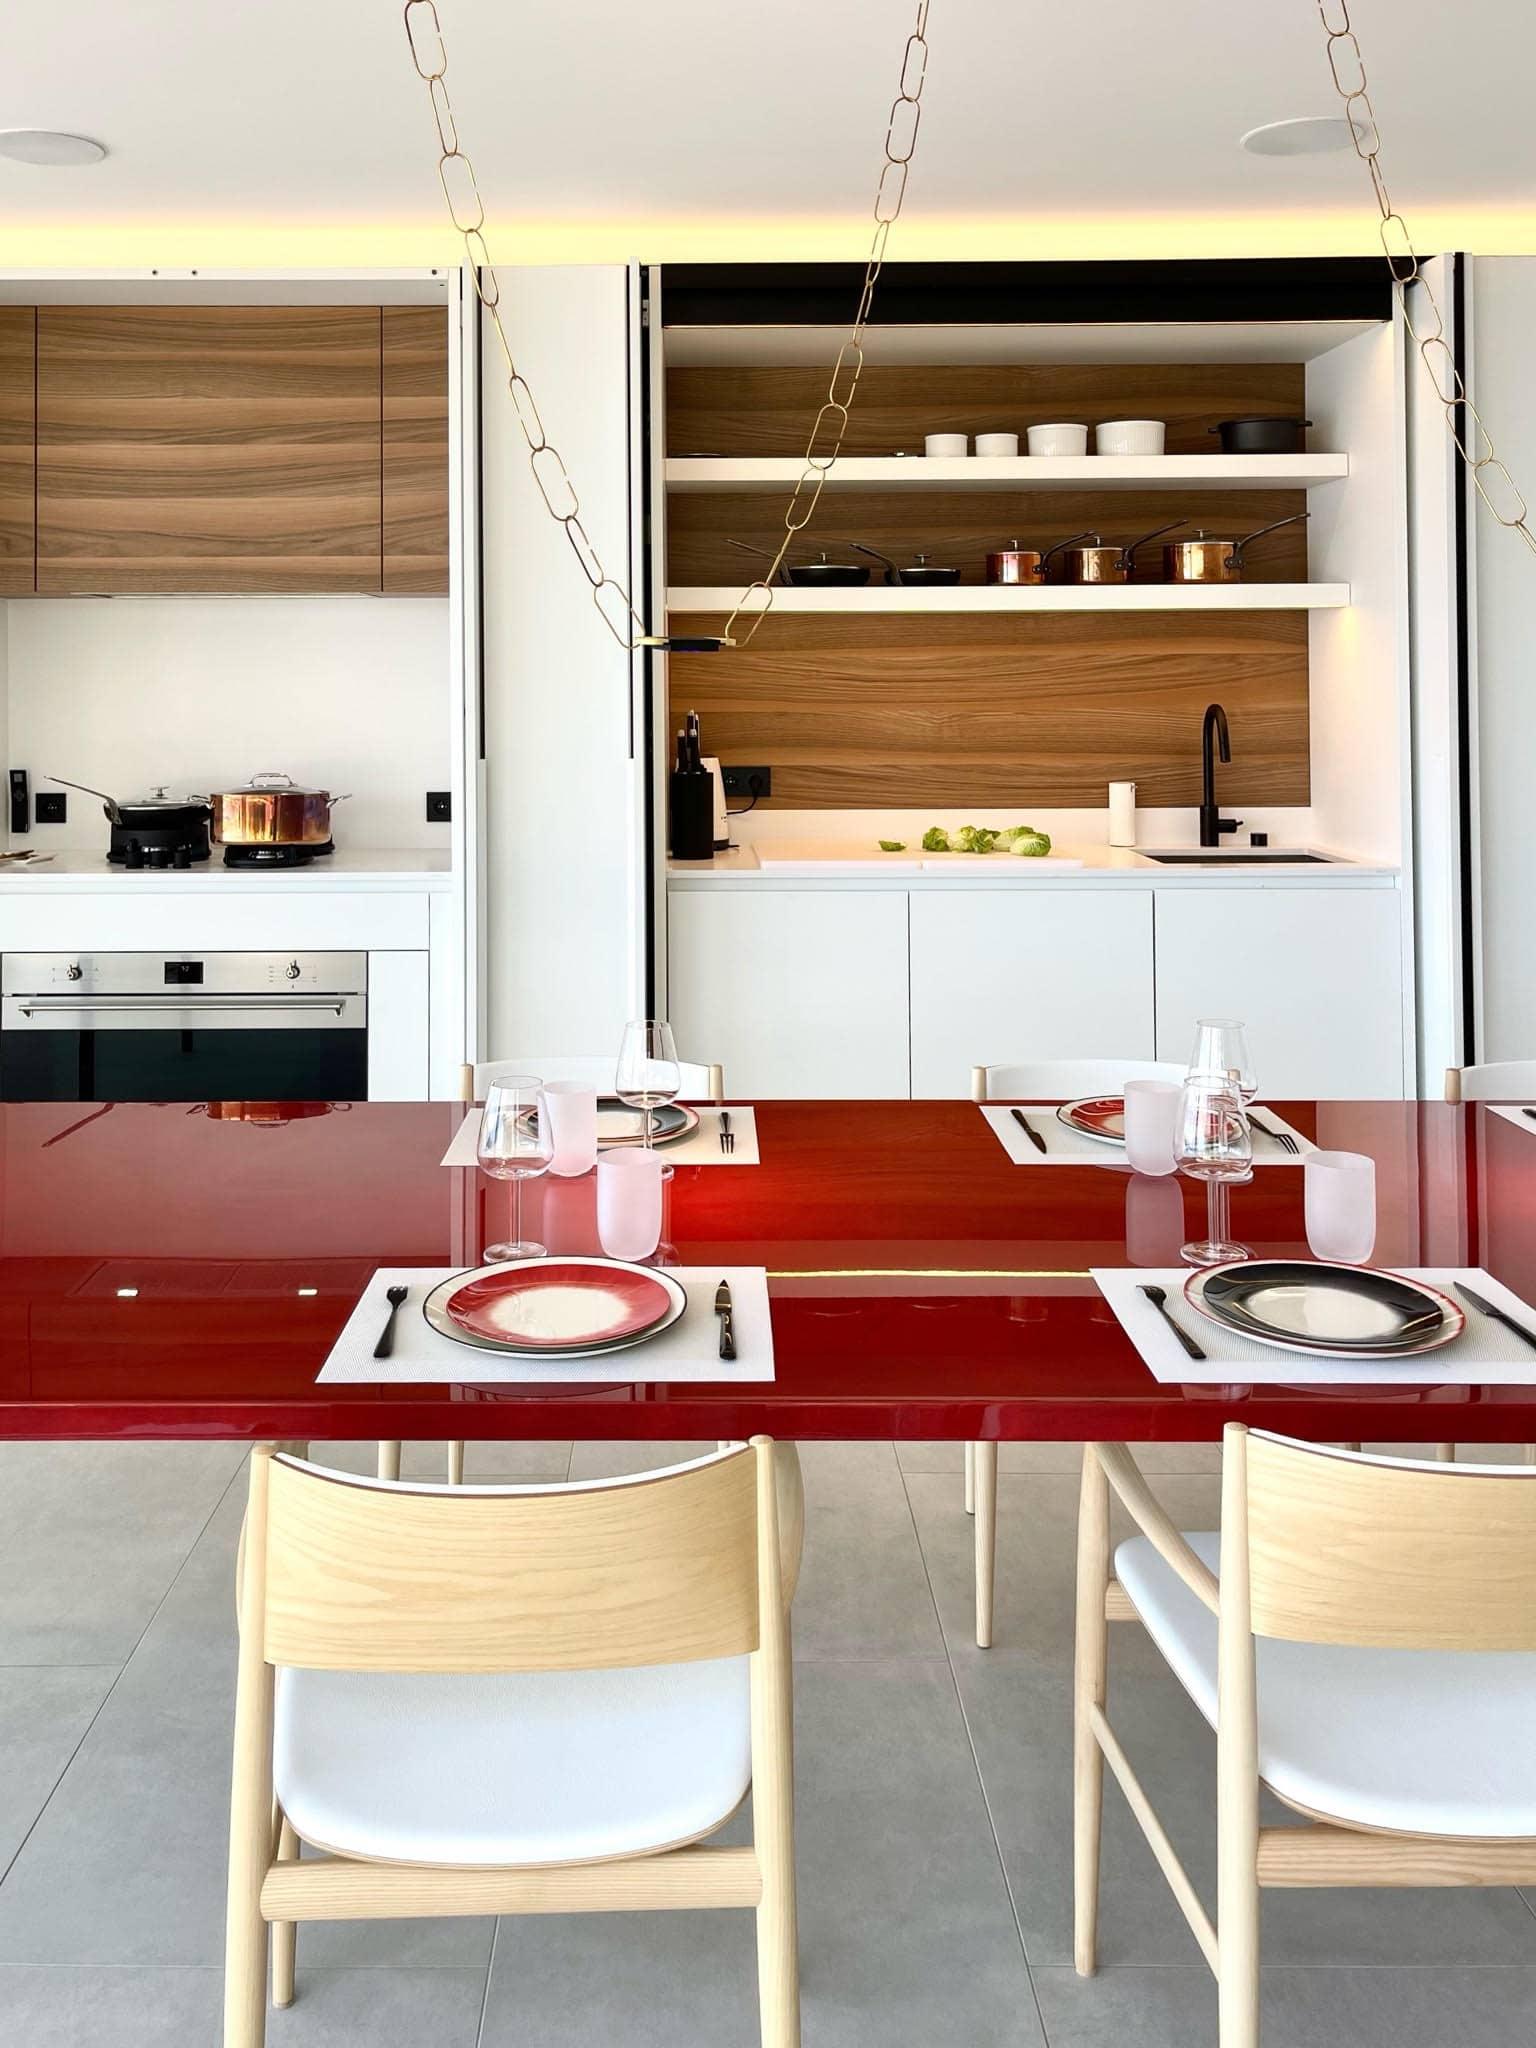 st-barts-villa-rental-by-owner-rbo